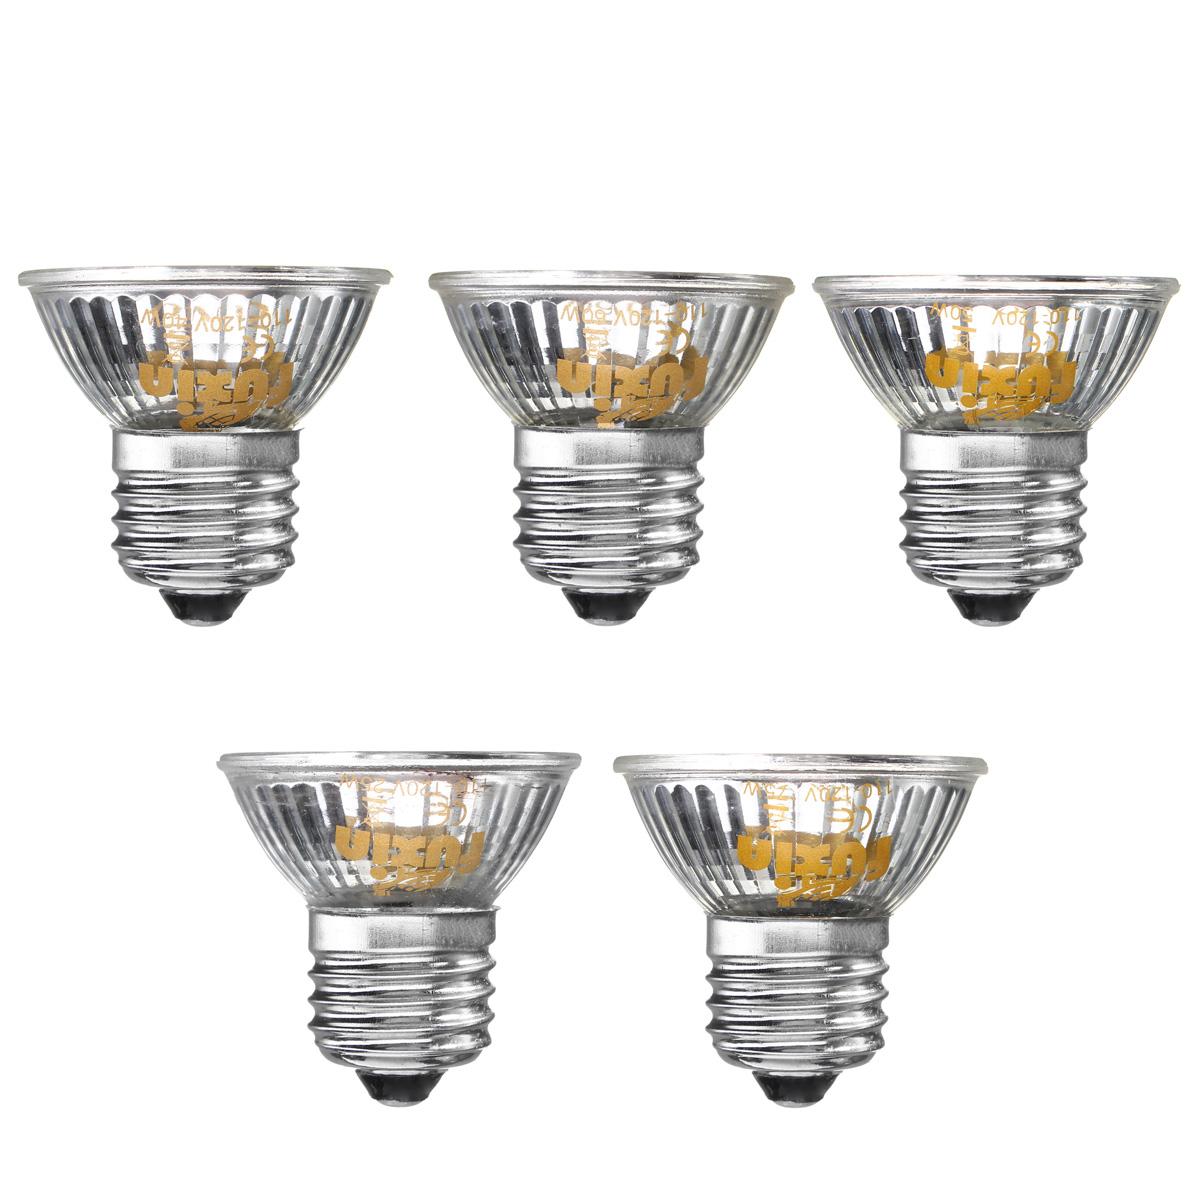 E27 25w 40w 50w 60w 75w Uva Uvb Led Light Bulb Reptile Pet Terrarium Brooder Heater Lamp Ac110v